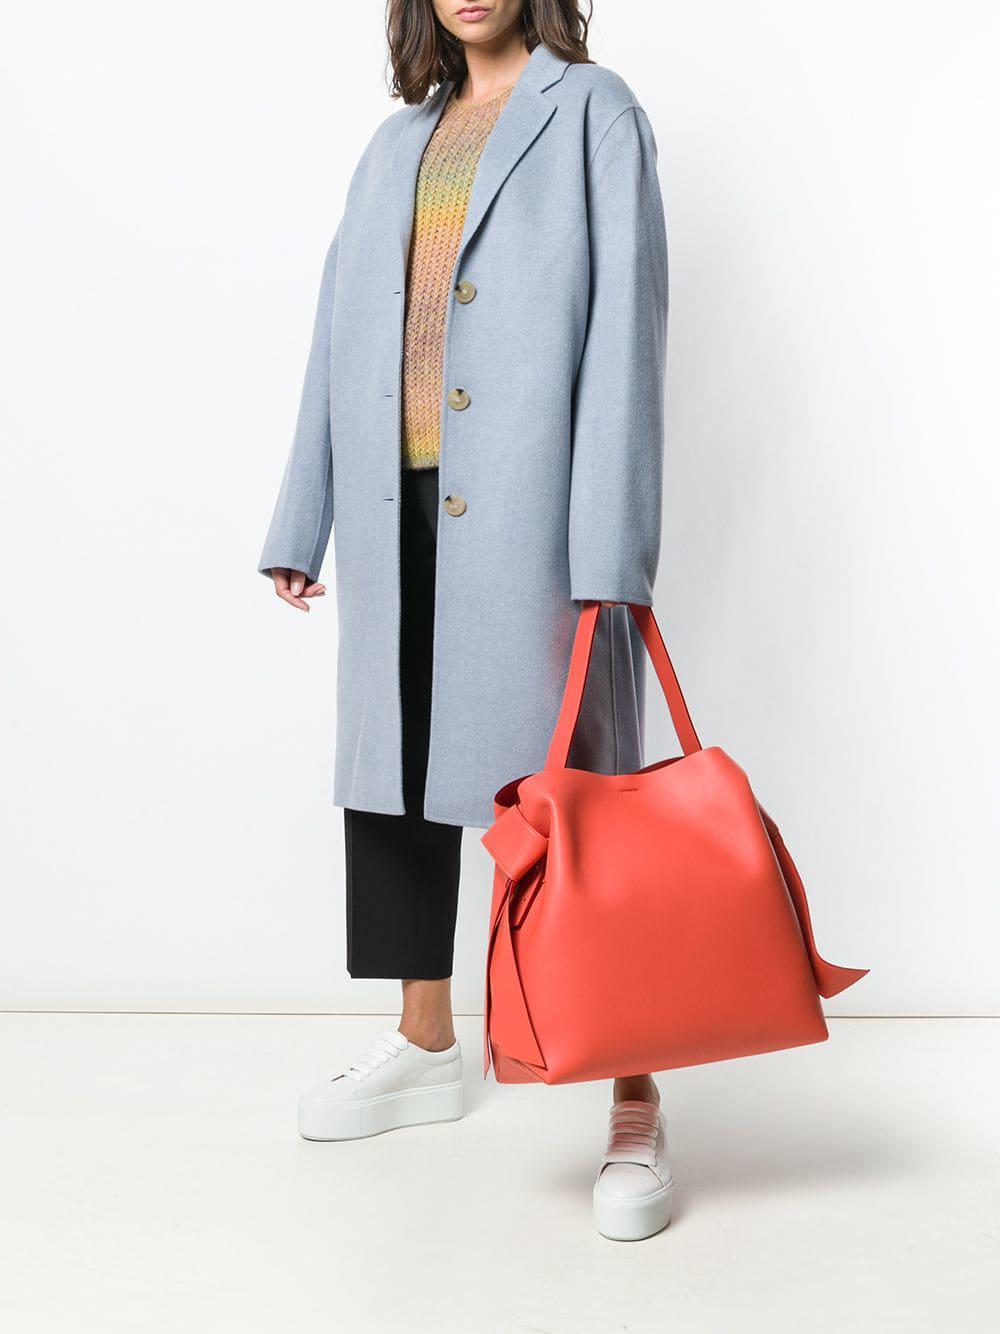 8ea25adbbb Lyst - Grand sac porté épaule Musubi Acne Studios en coloris Orange